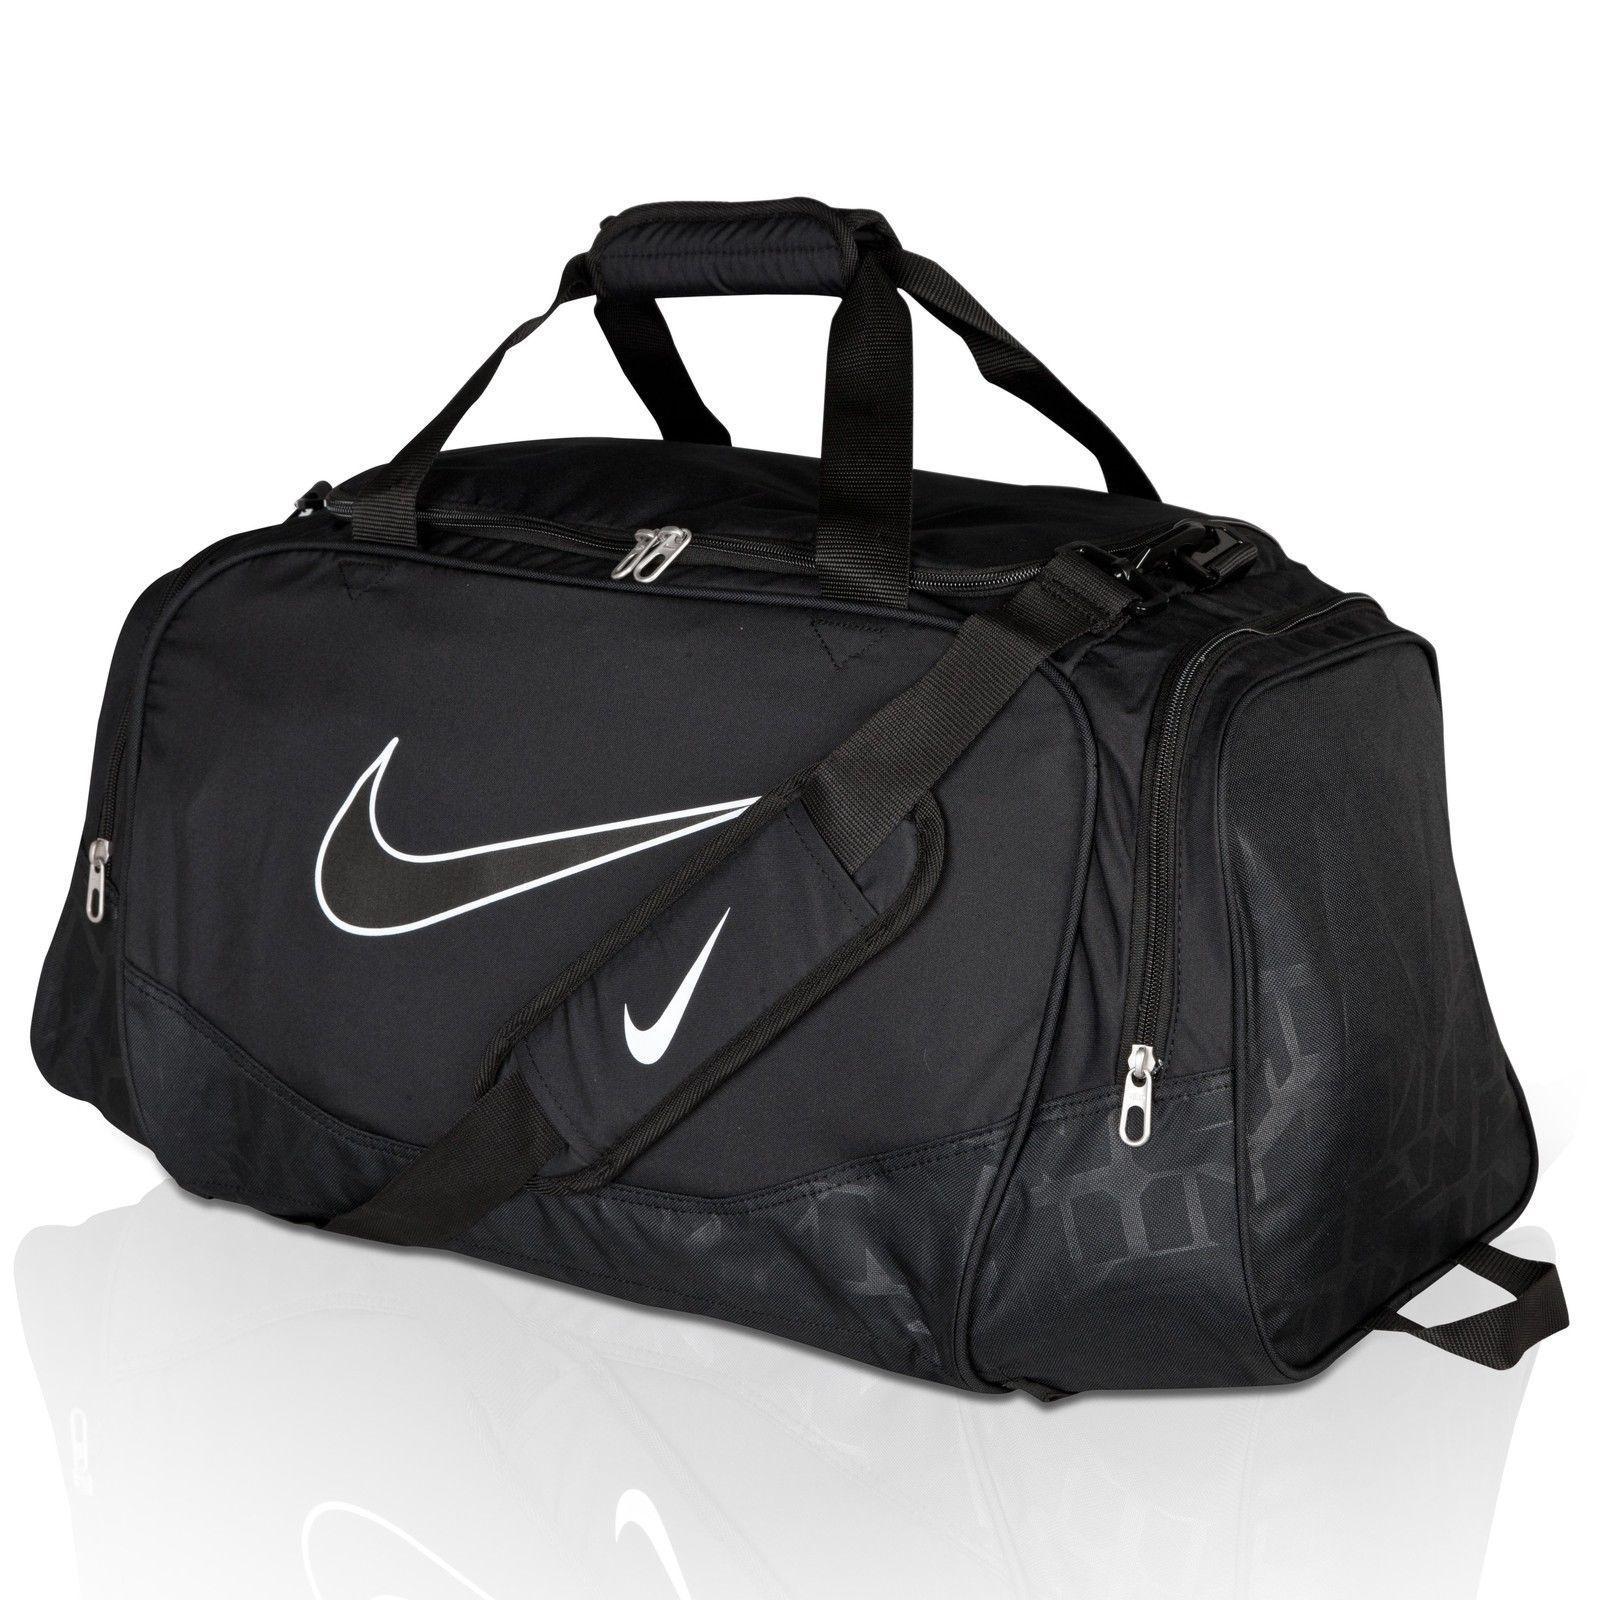 nike luggage bag travel luggage bags guess luggage bags